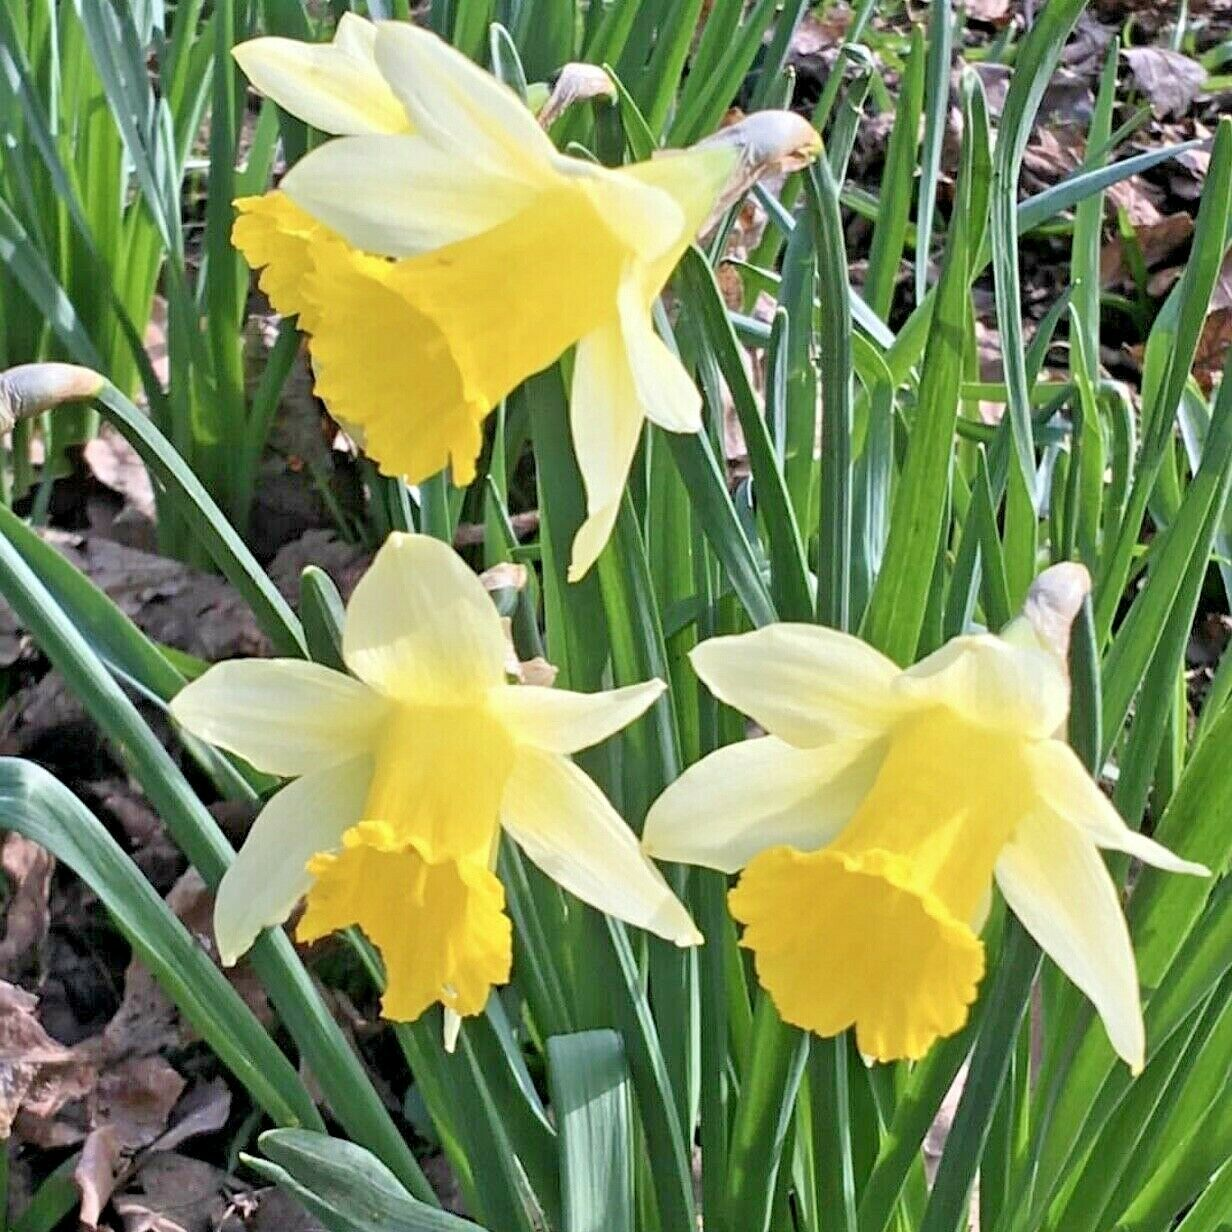 WILD DAFFODILS BULBS | Lobularis Lent Lily | Top Quality Narcissus